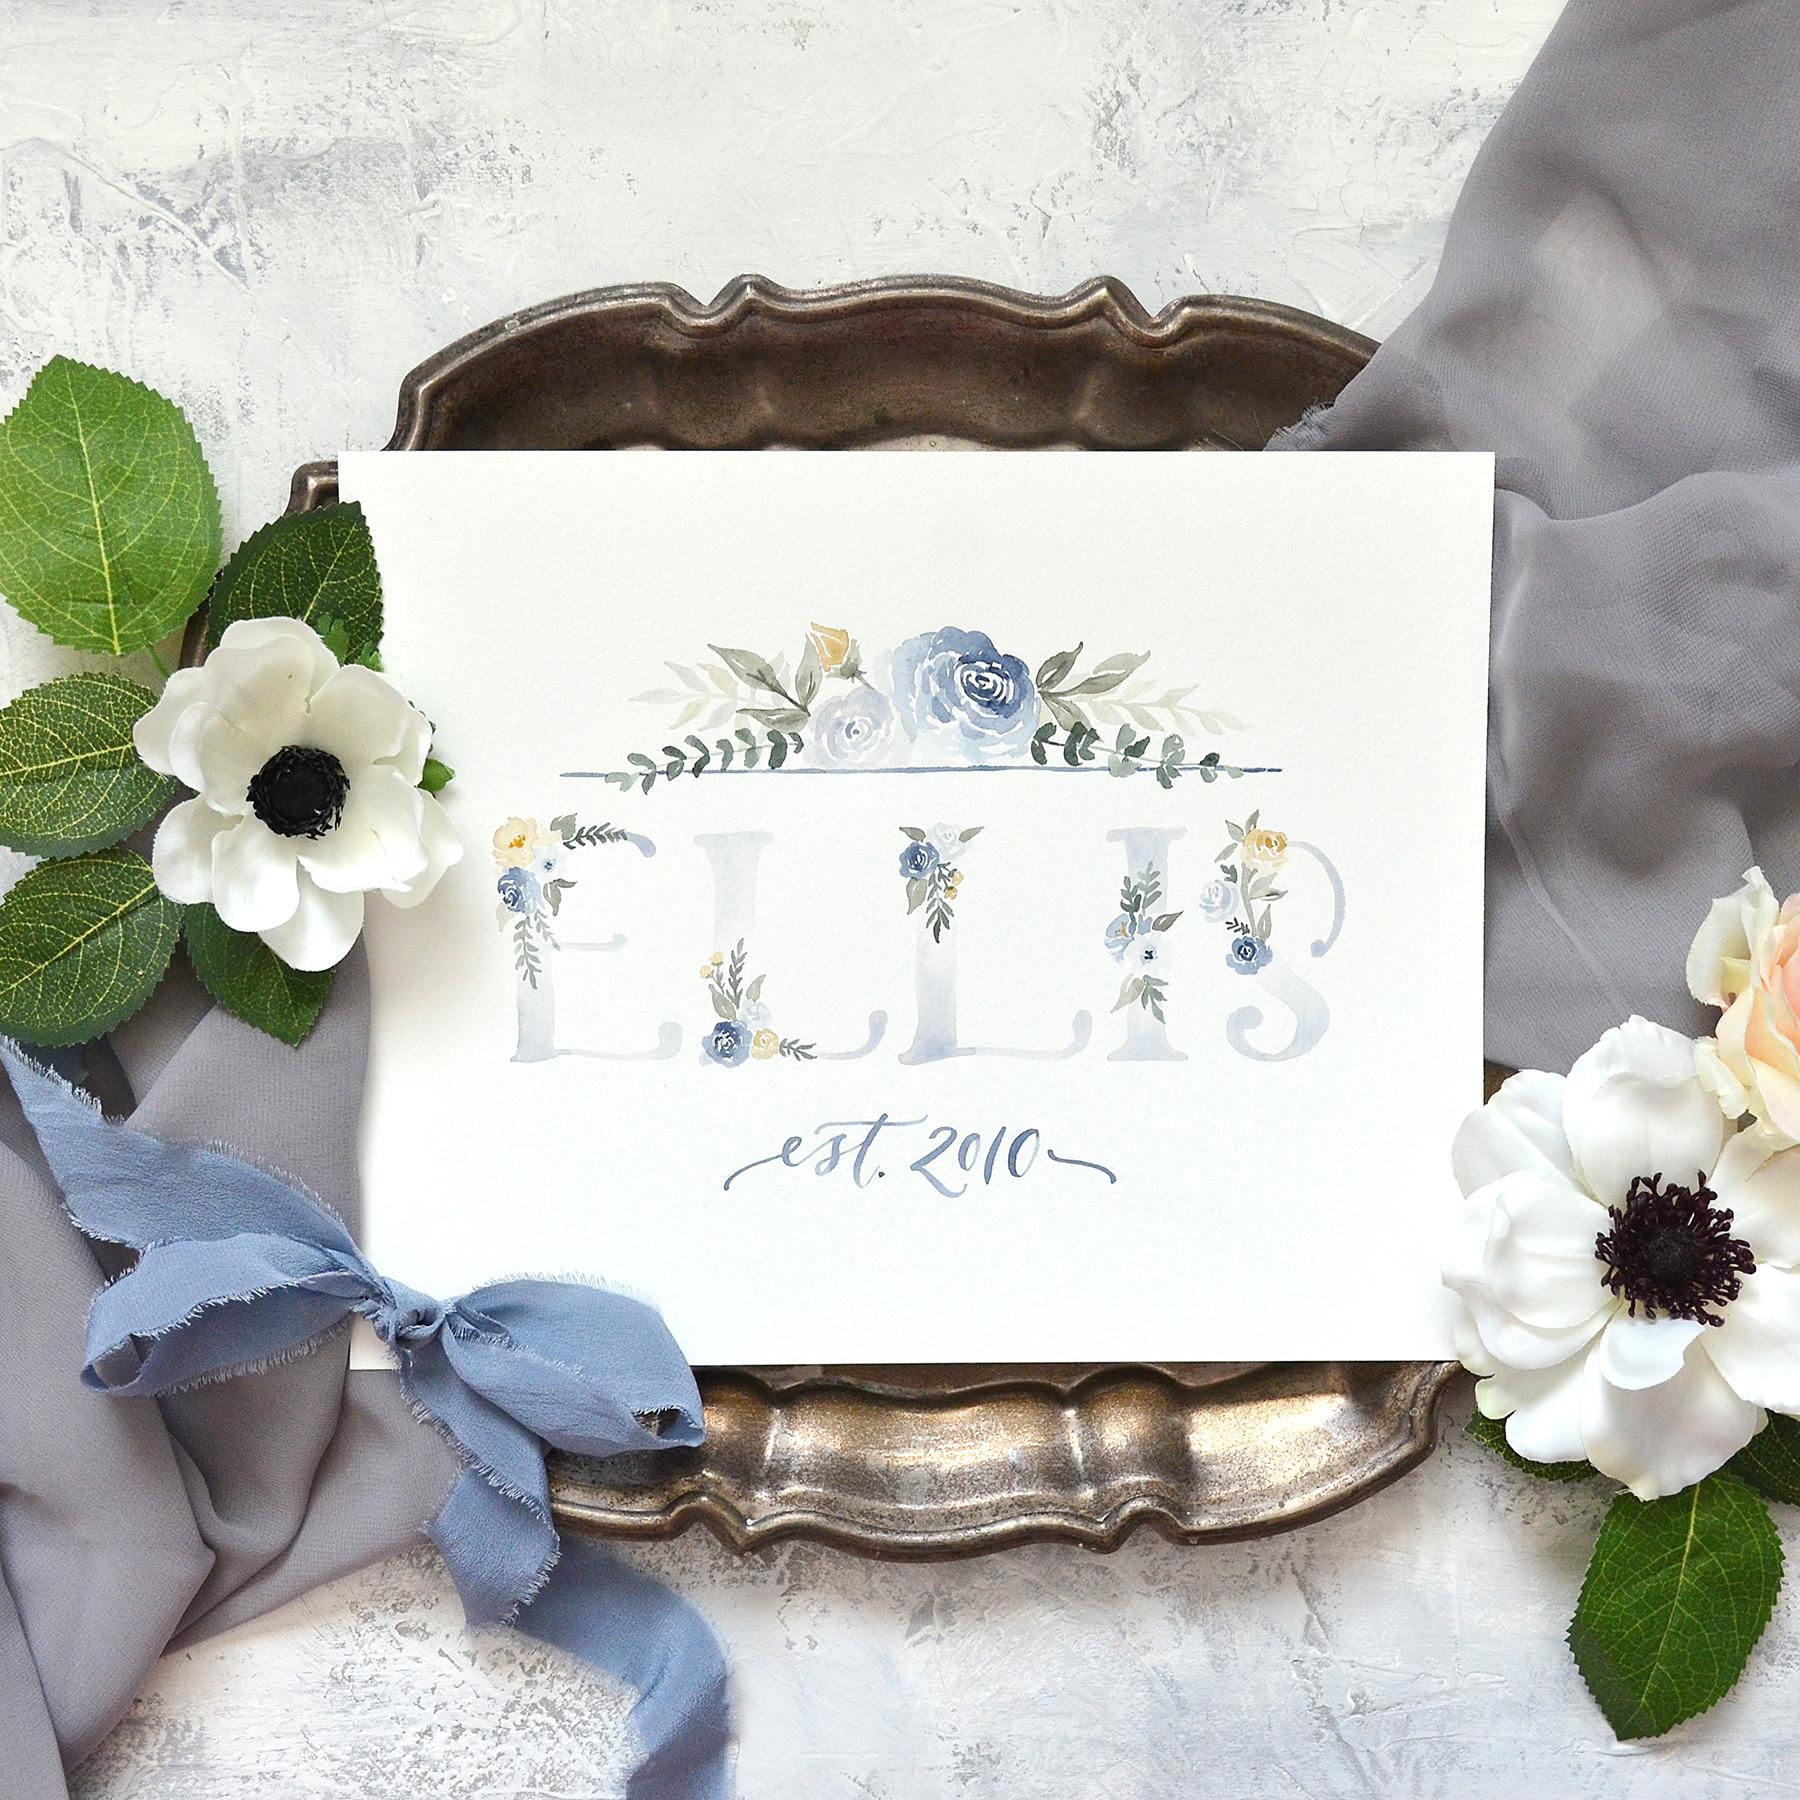 Sam Allen Creates – Watercolor Floral Family Last Name Sign, Ellis